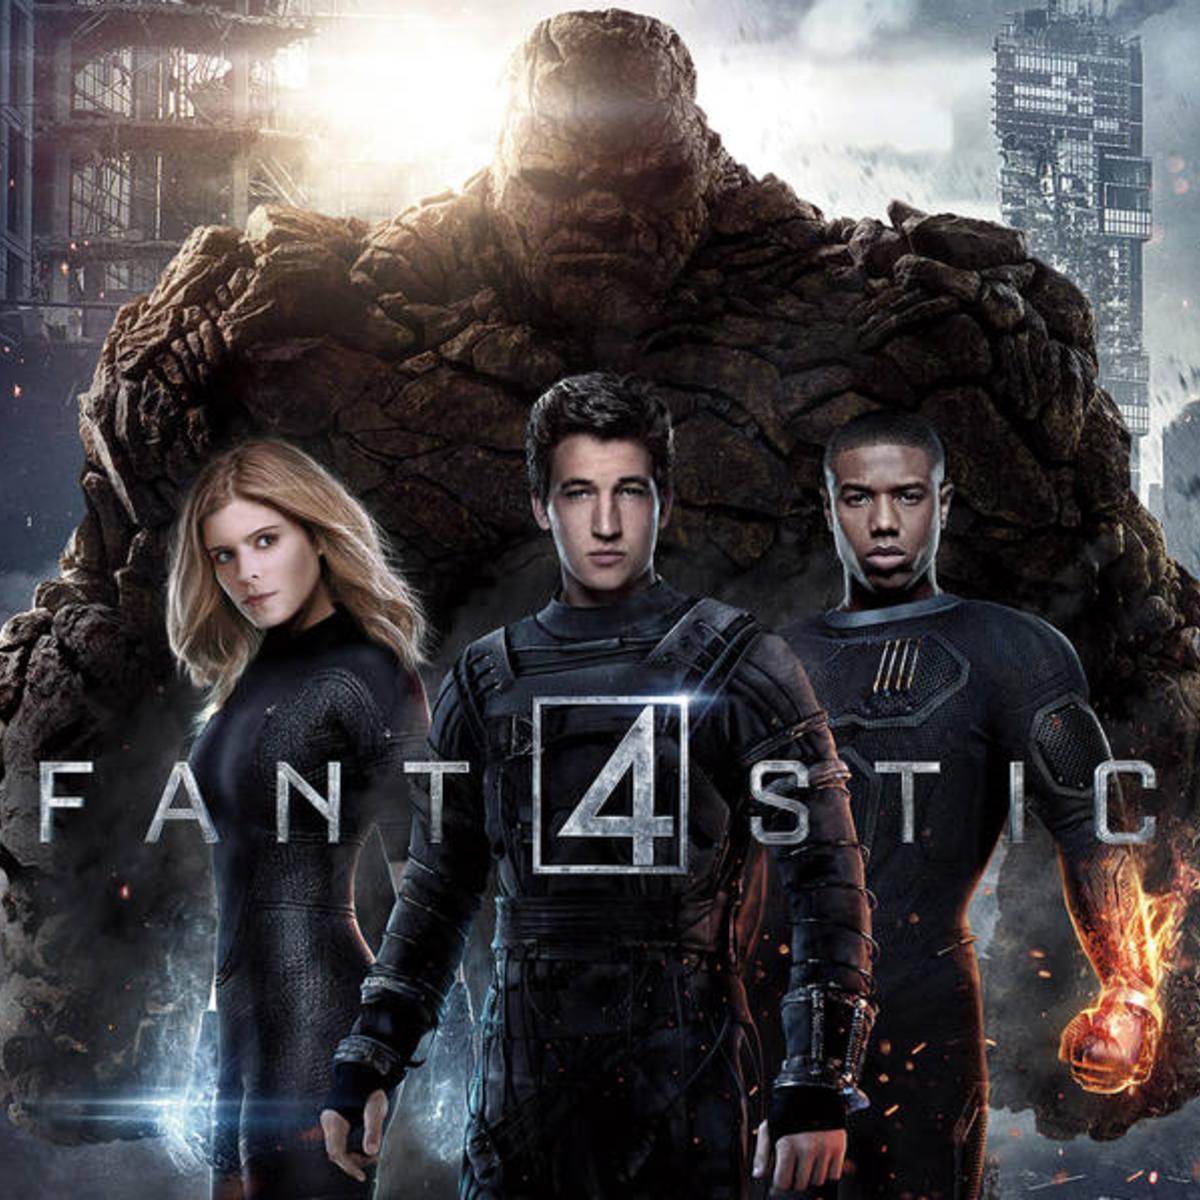 FF4_character_poster_7.jpg